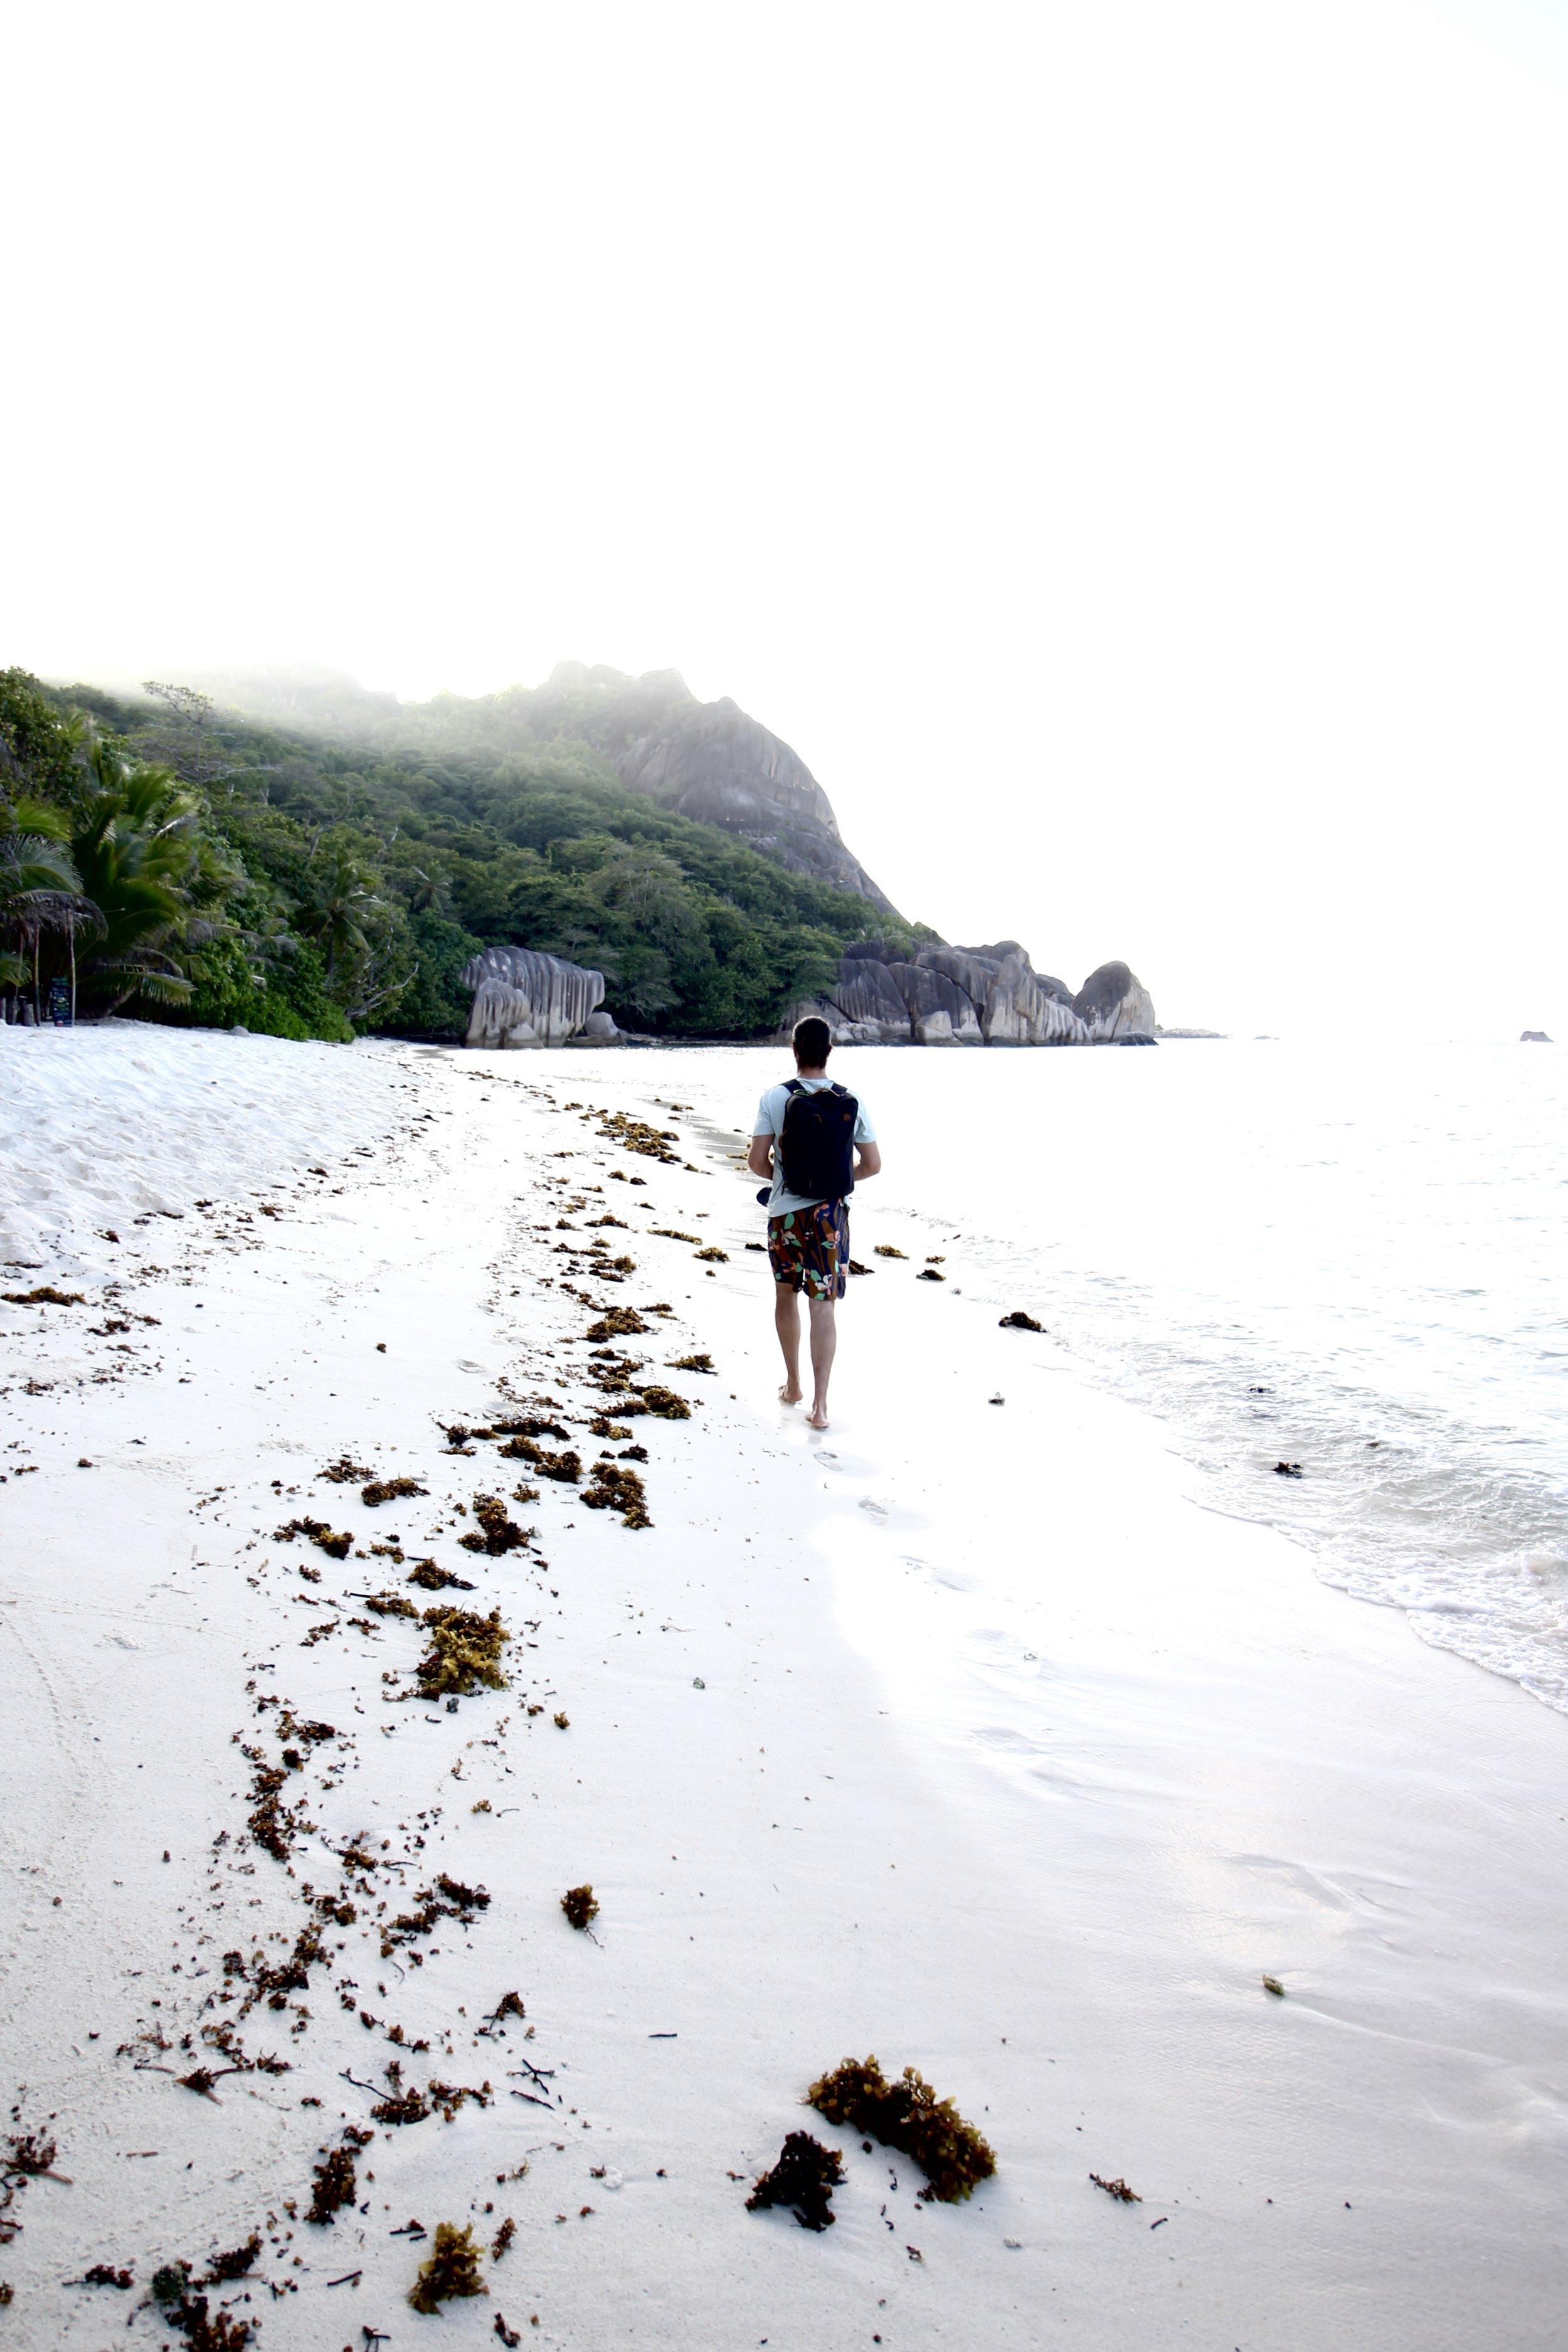 Anse Bonnet Carre on La Digue Island, Seychelles